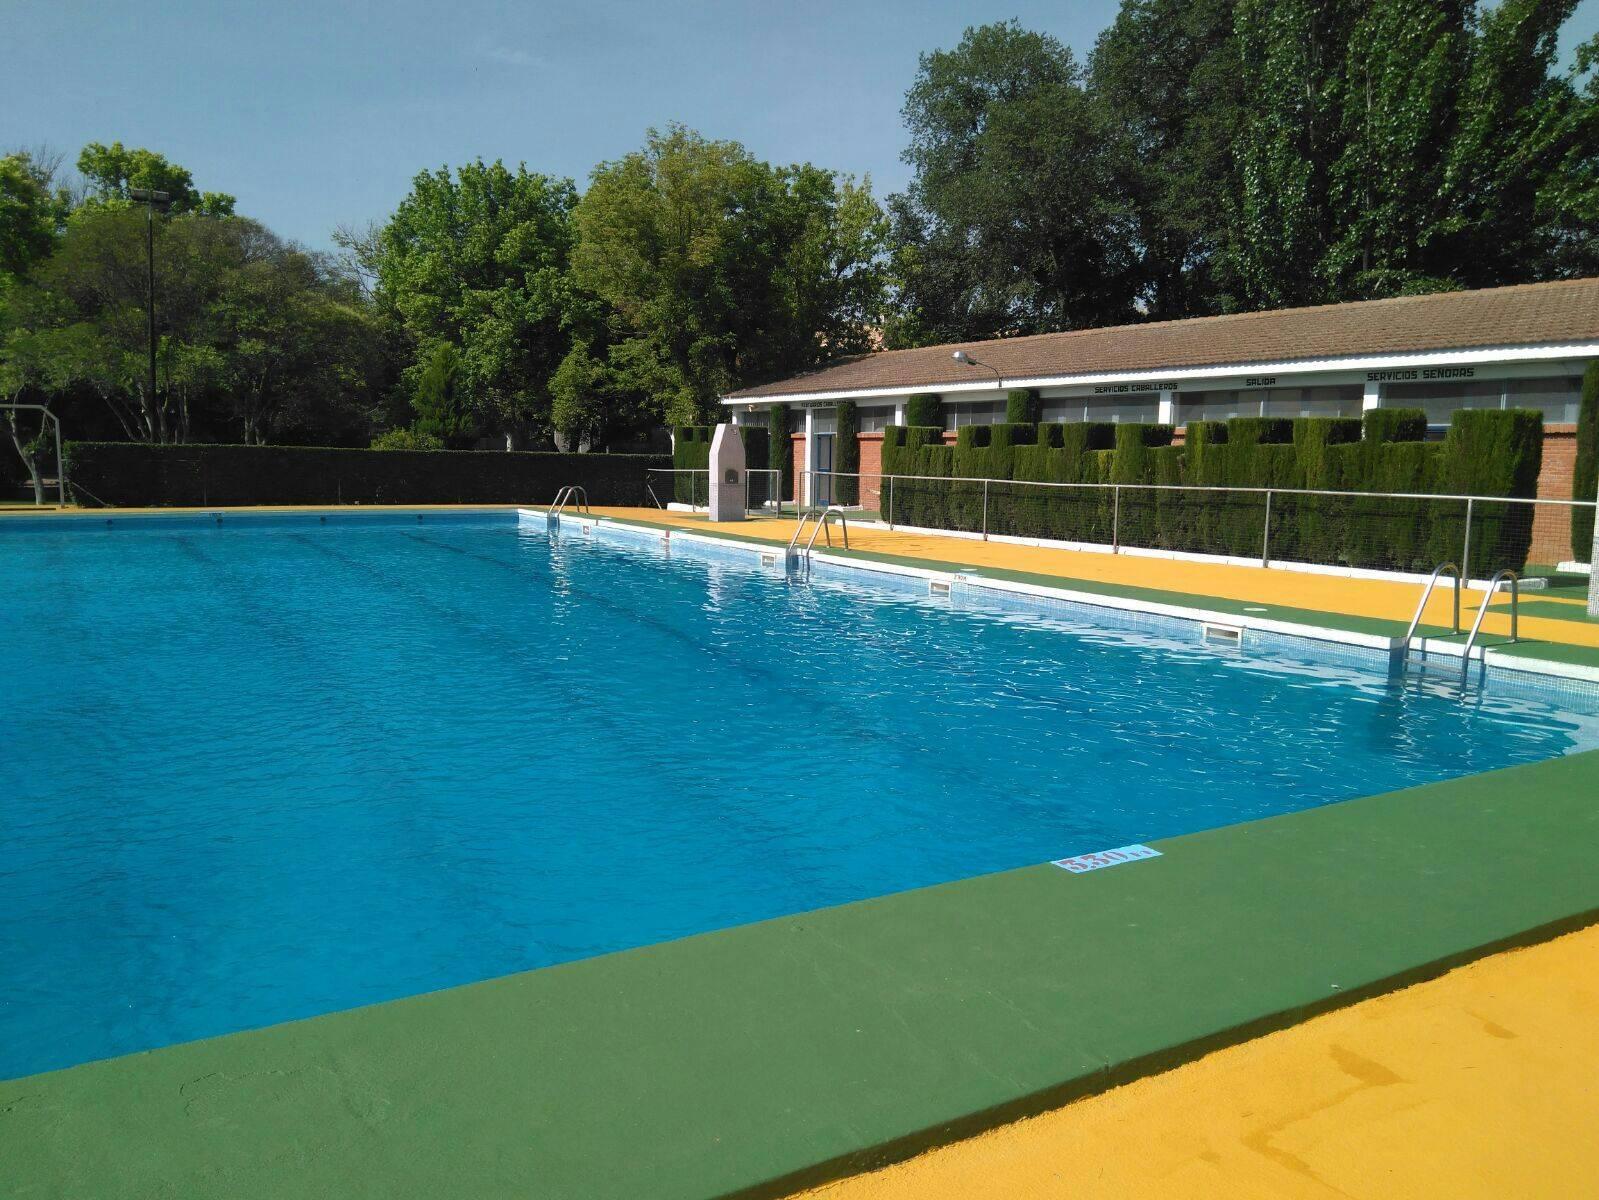 piscina municipal 2017 herencia 1 - Tarifas de la Piscina Municipal de Herencia para temporada 2018